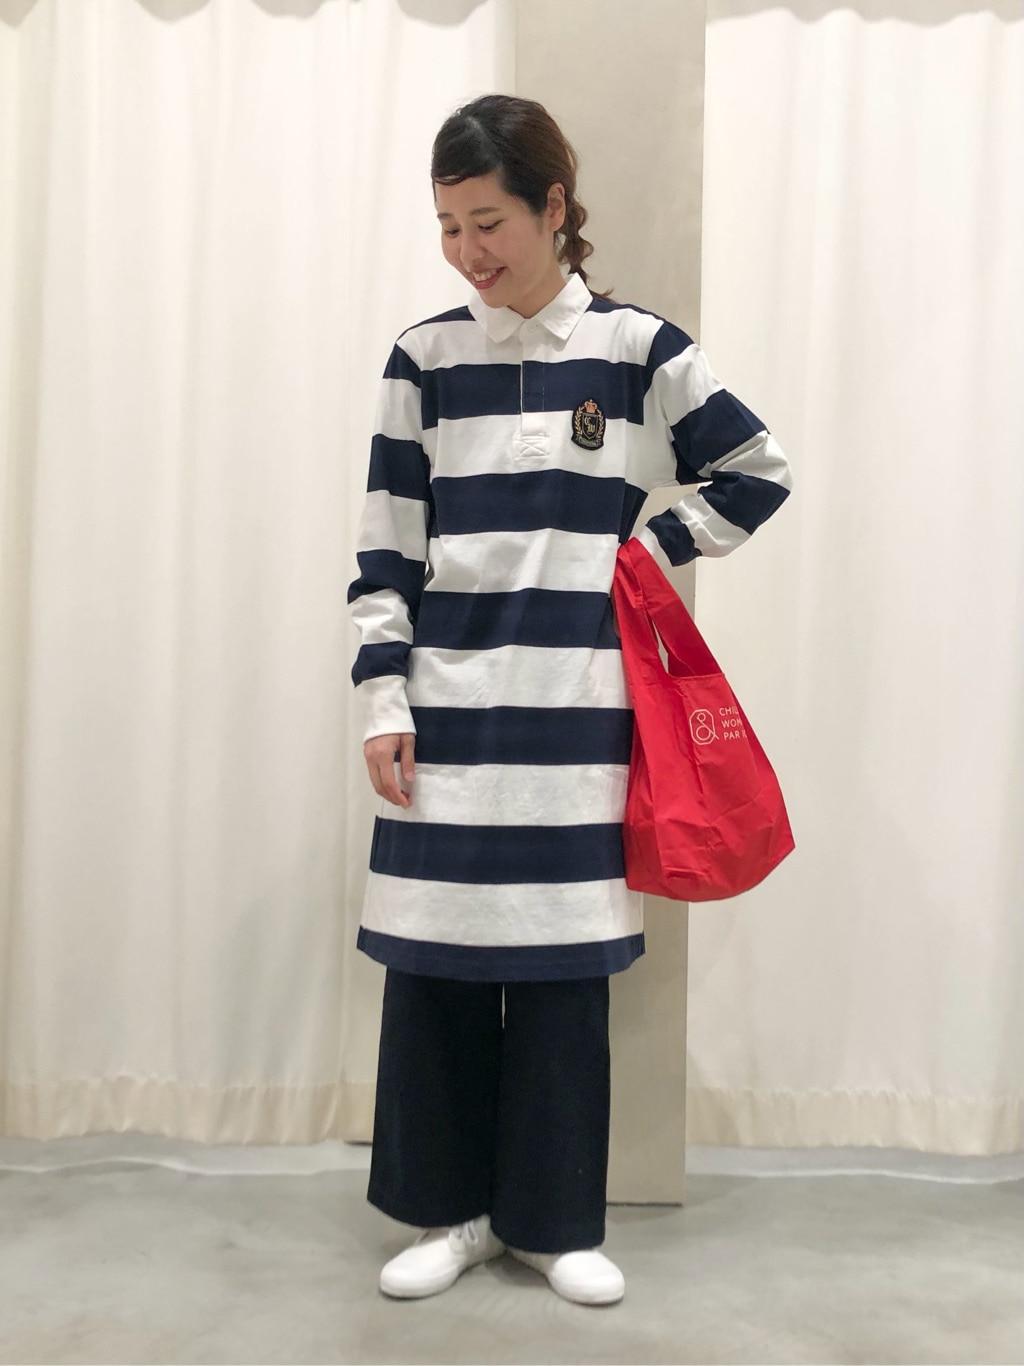 CHILD WOMAN , PAR ICI 東京スカイツリータウン・ソラマチ 2021.02.16